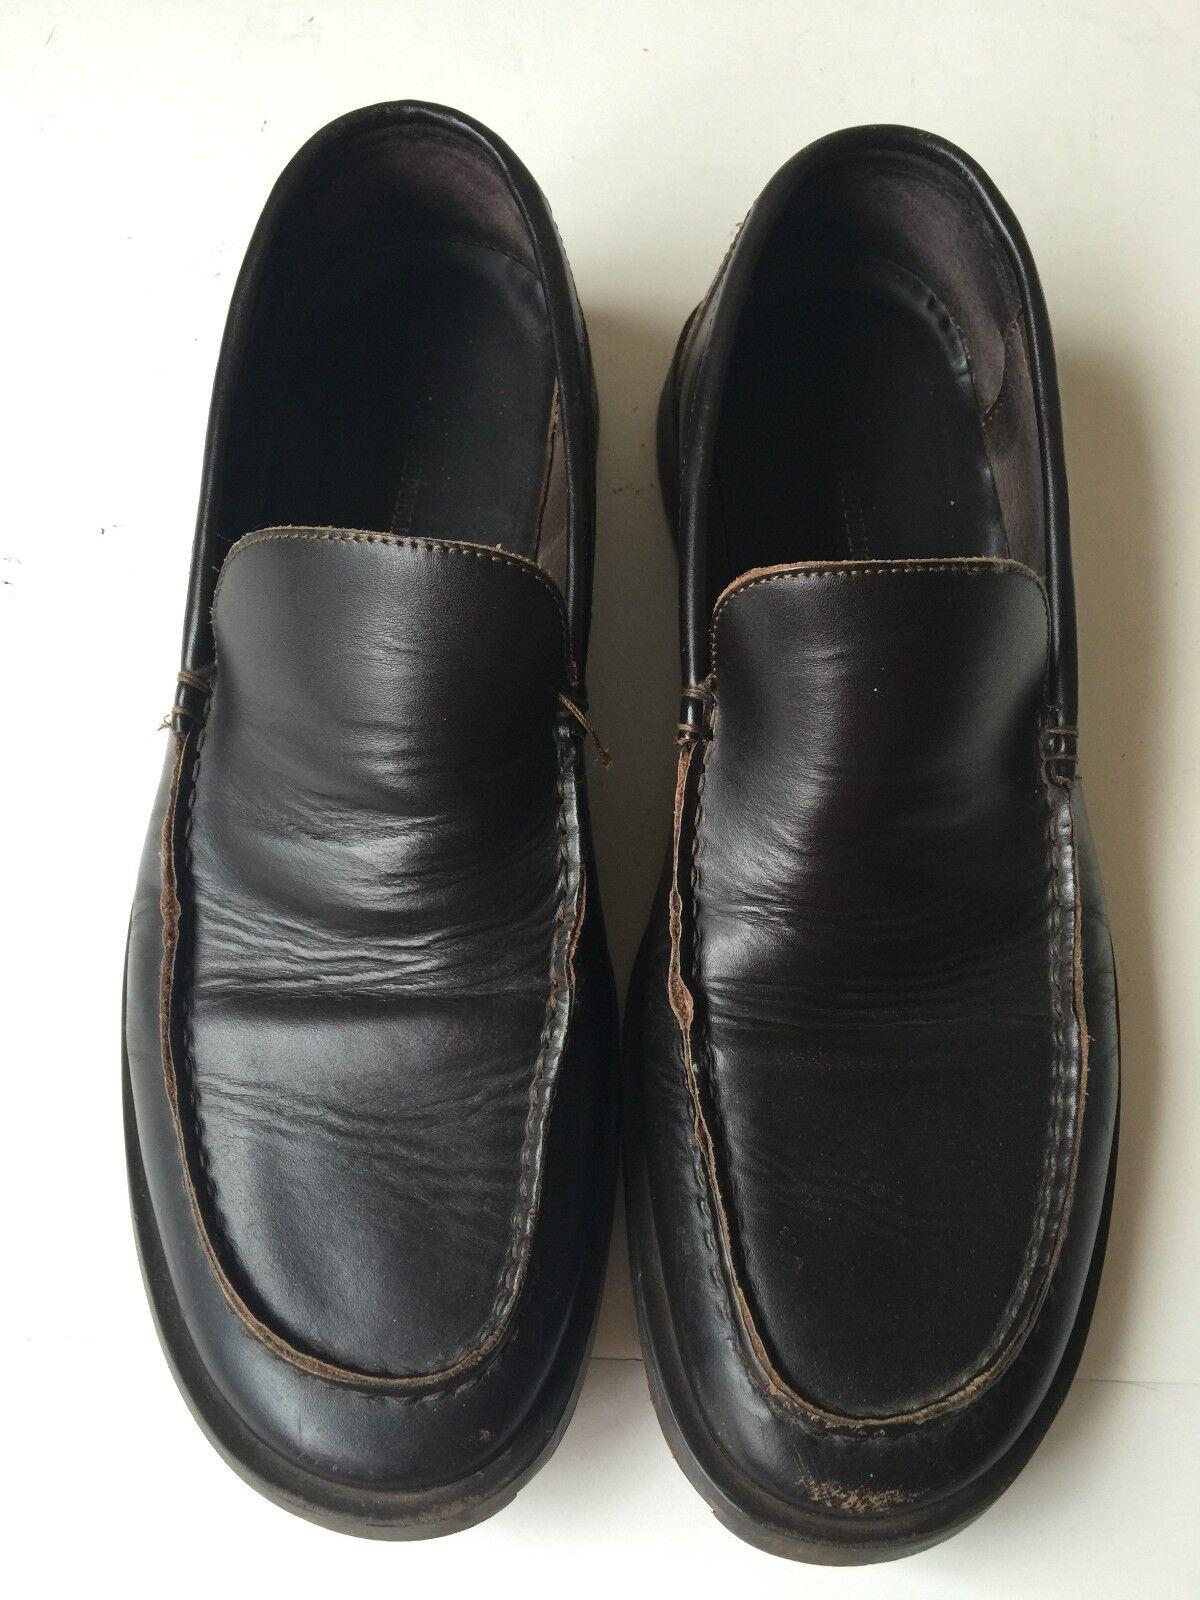 Banana Republic Mens Brown (Sz Leather Slip-On Loafer Shoes (Sz Brown 10 D) 0d57c8